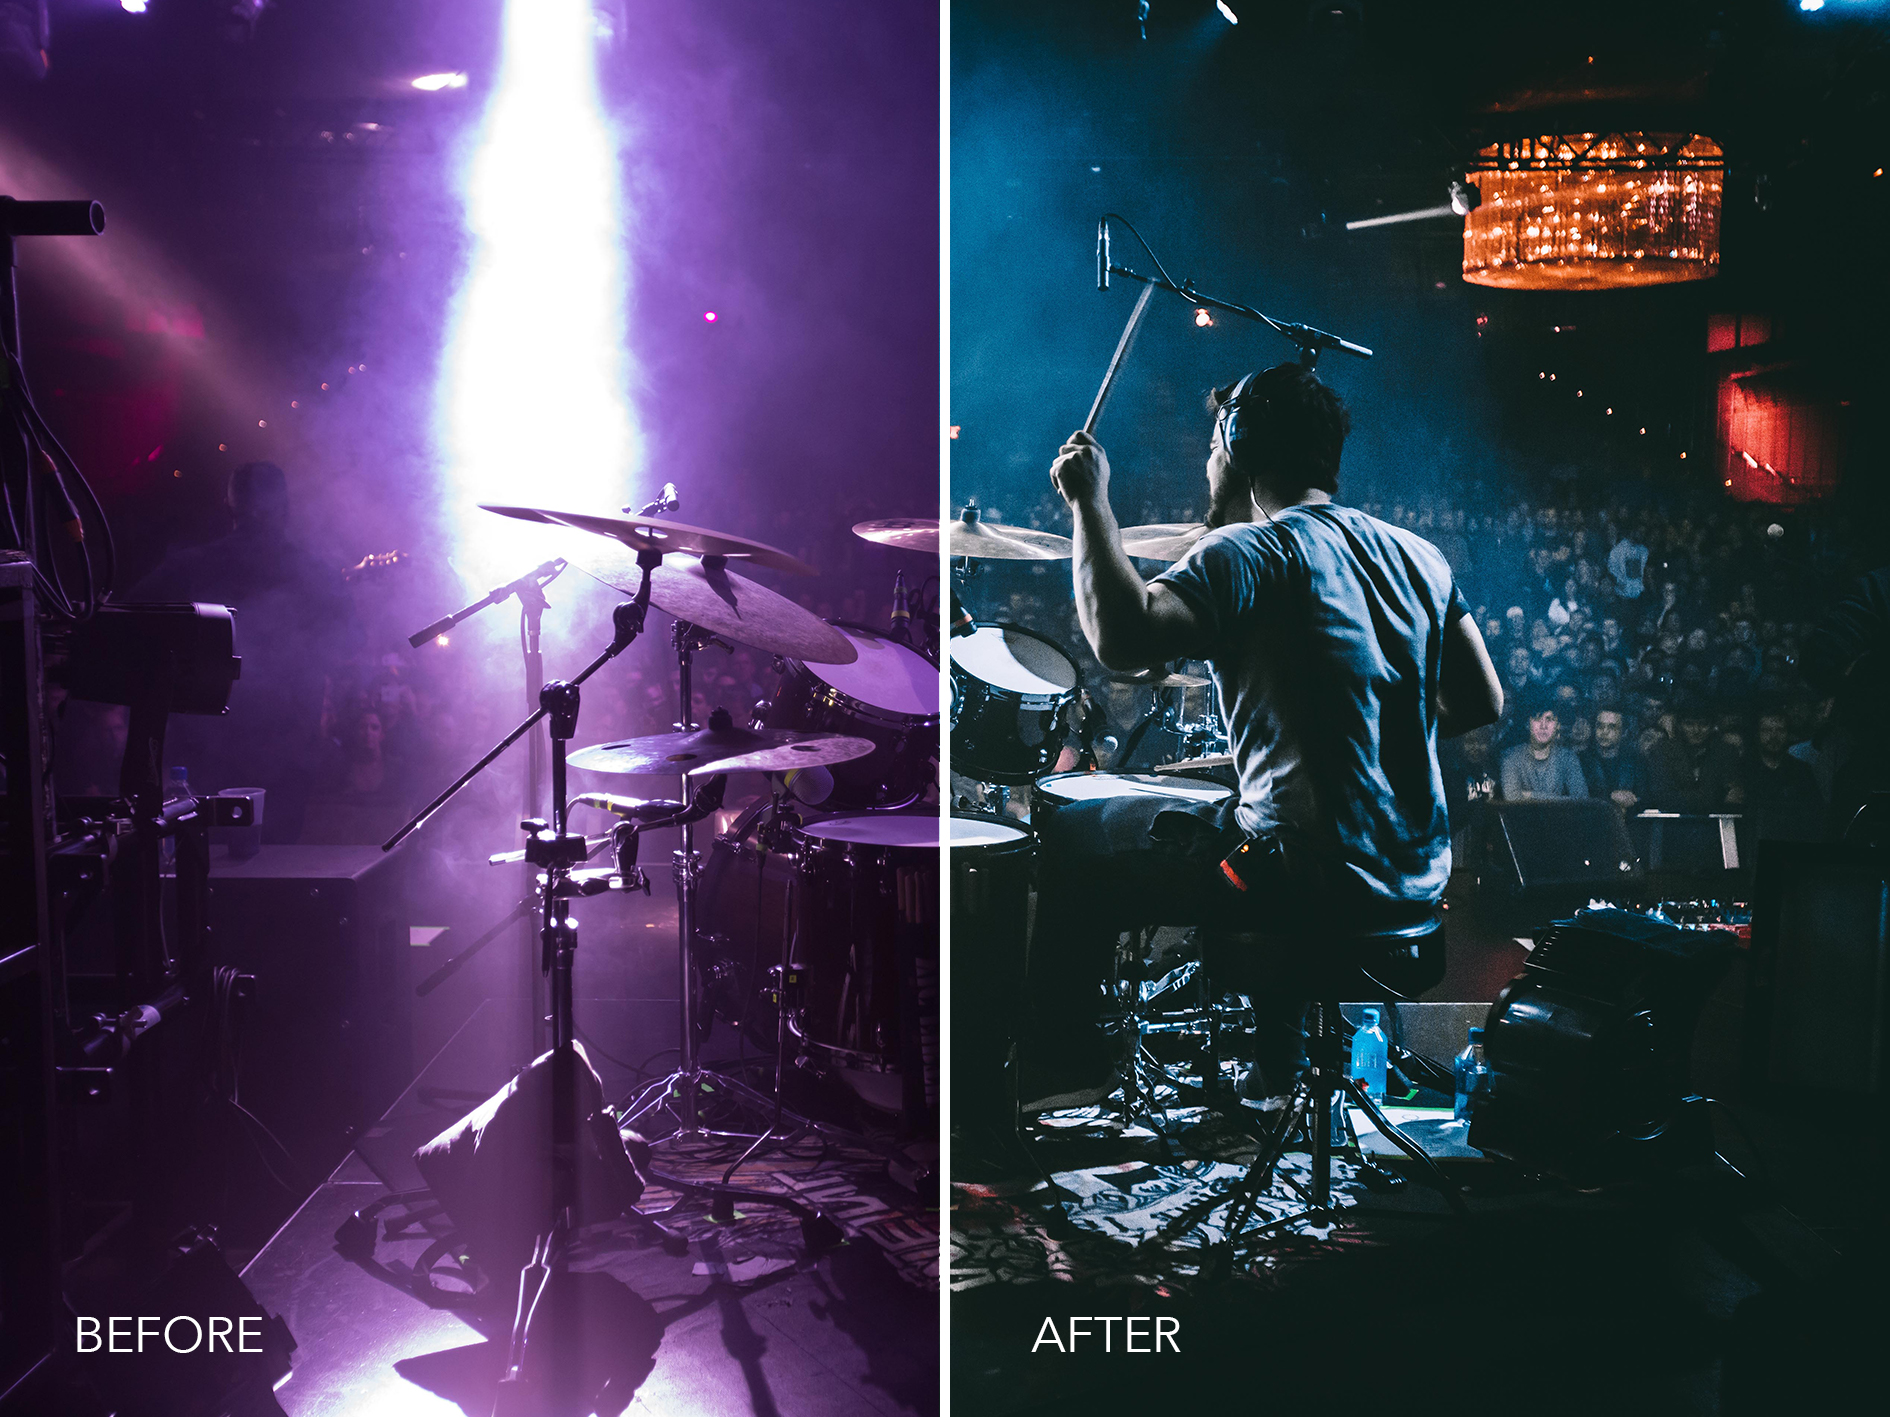 3.Purple to Blue - Merrick Winter Live Music Lightroom Presets - FilterGrade